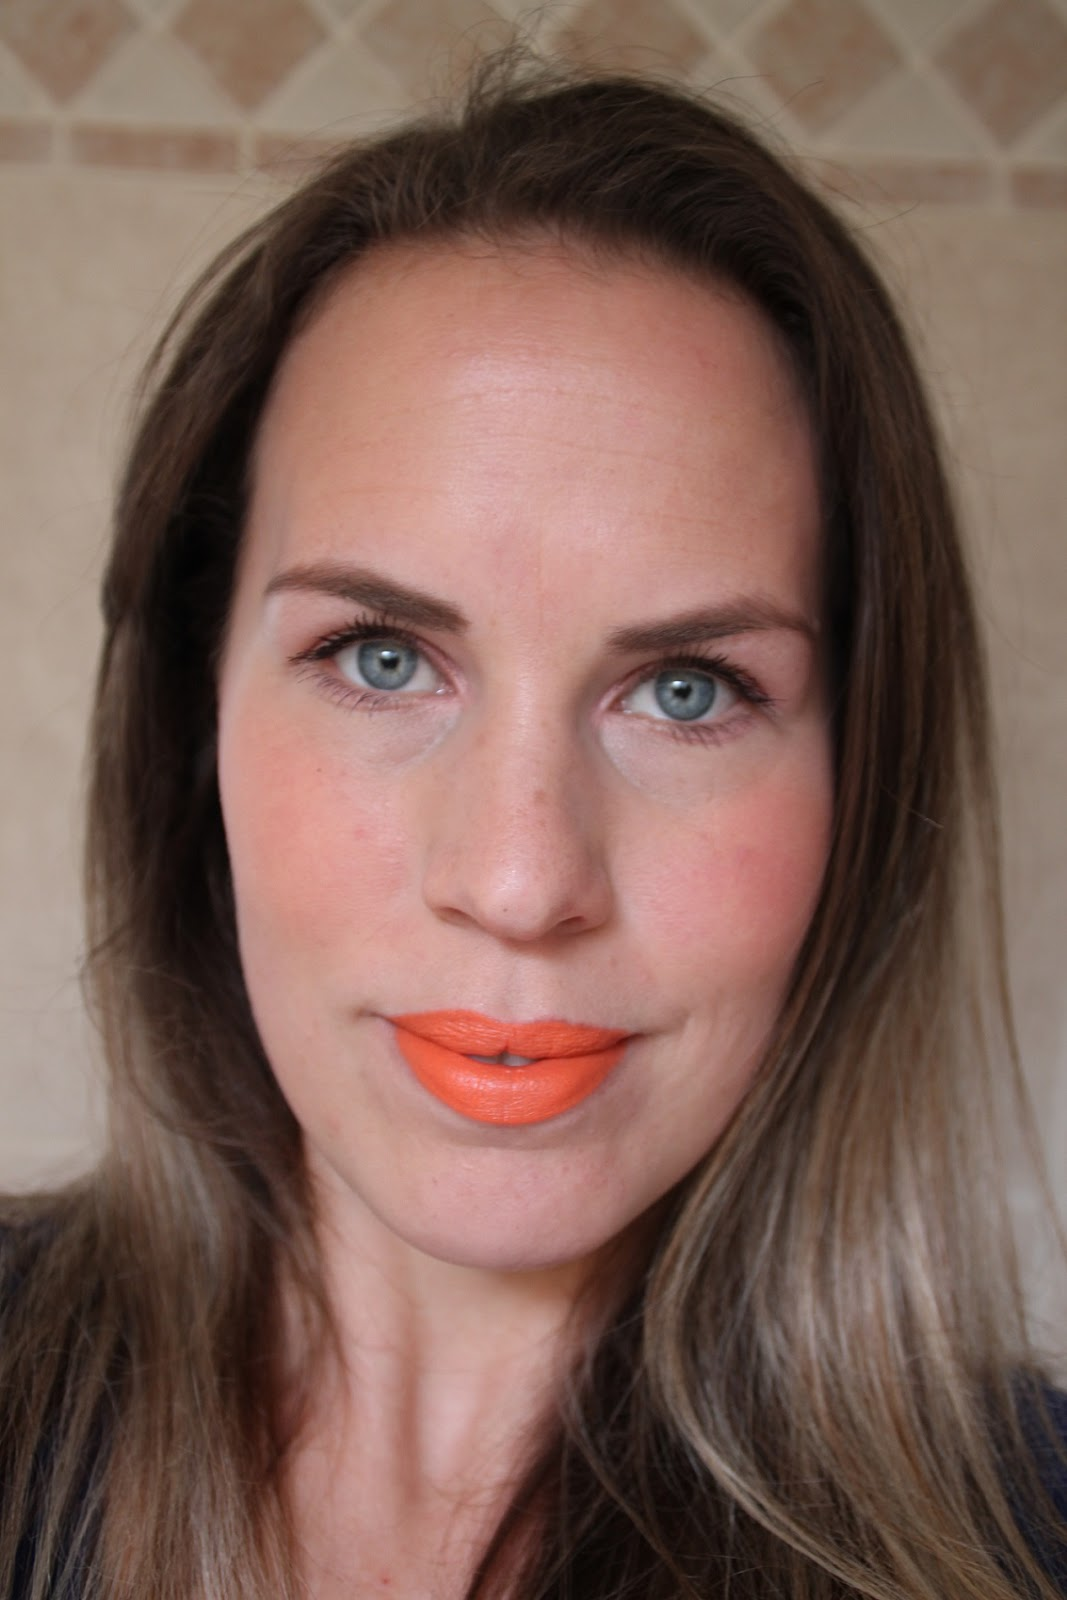 Crystaliciousss Mac Hailey Williams Lipstick Sounds Like: MAC Hailey Williams Lipstick Sounds Like Noise